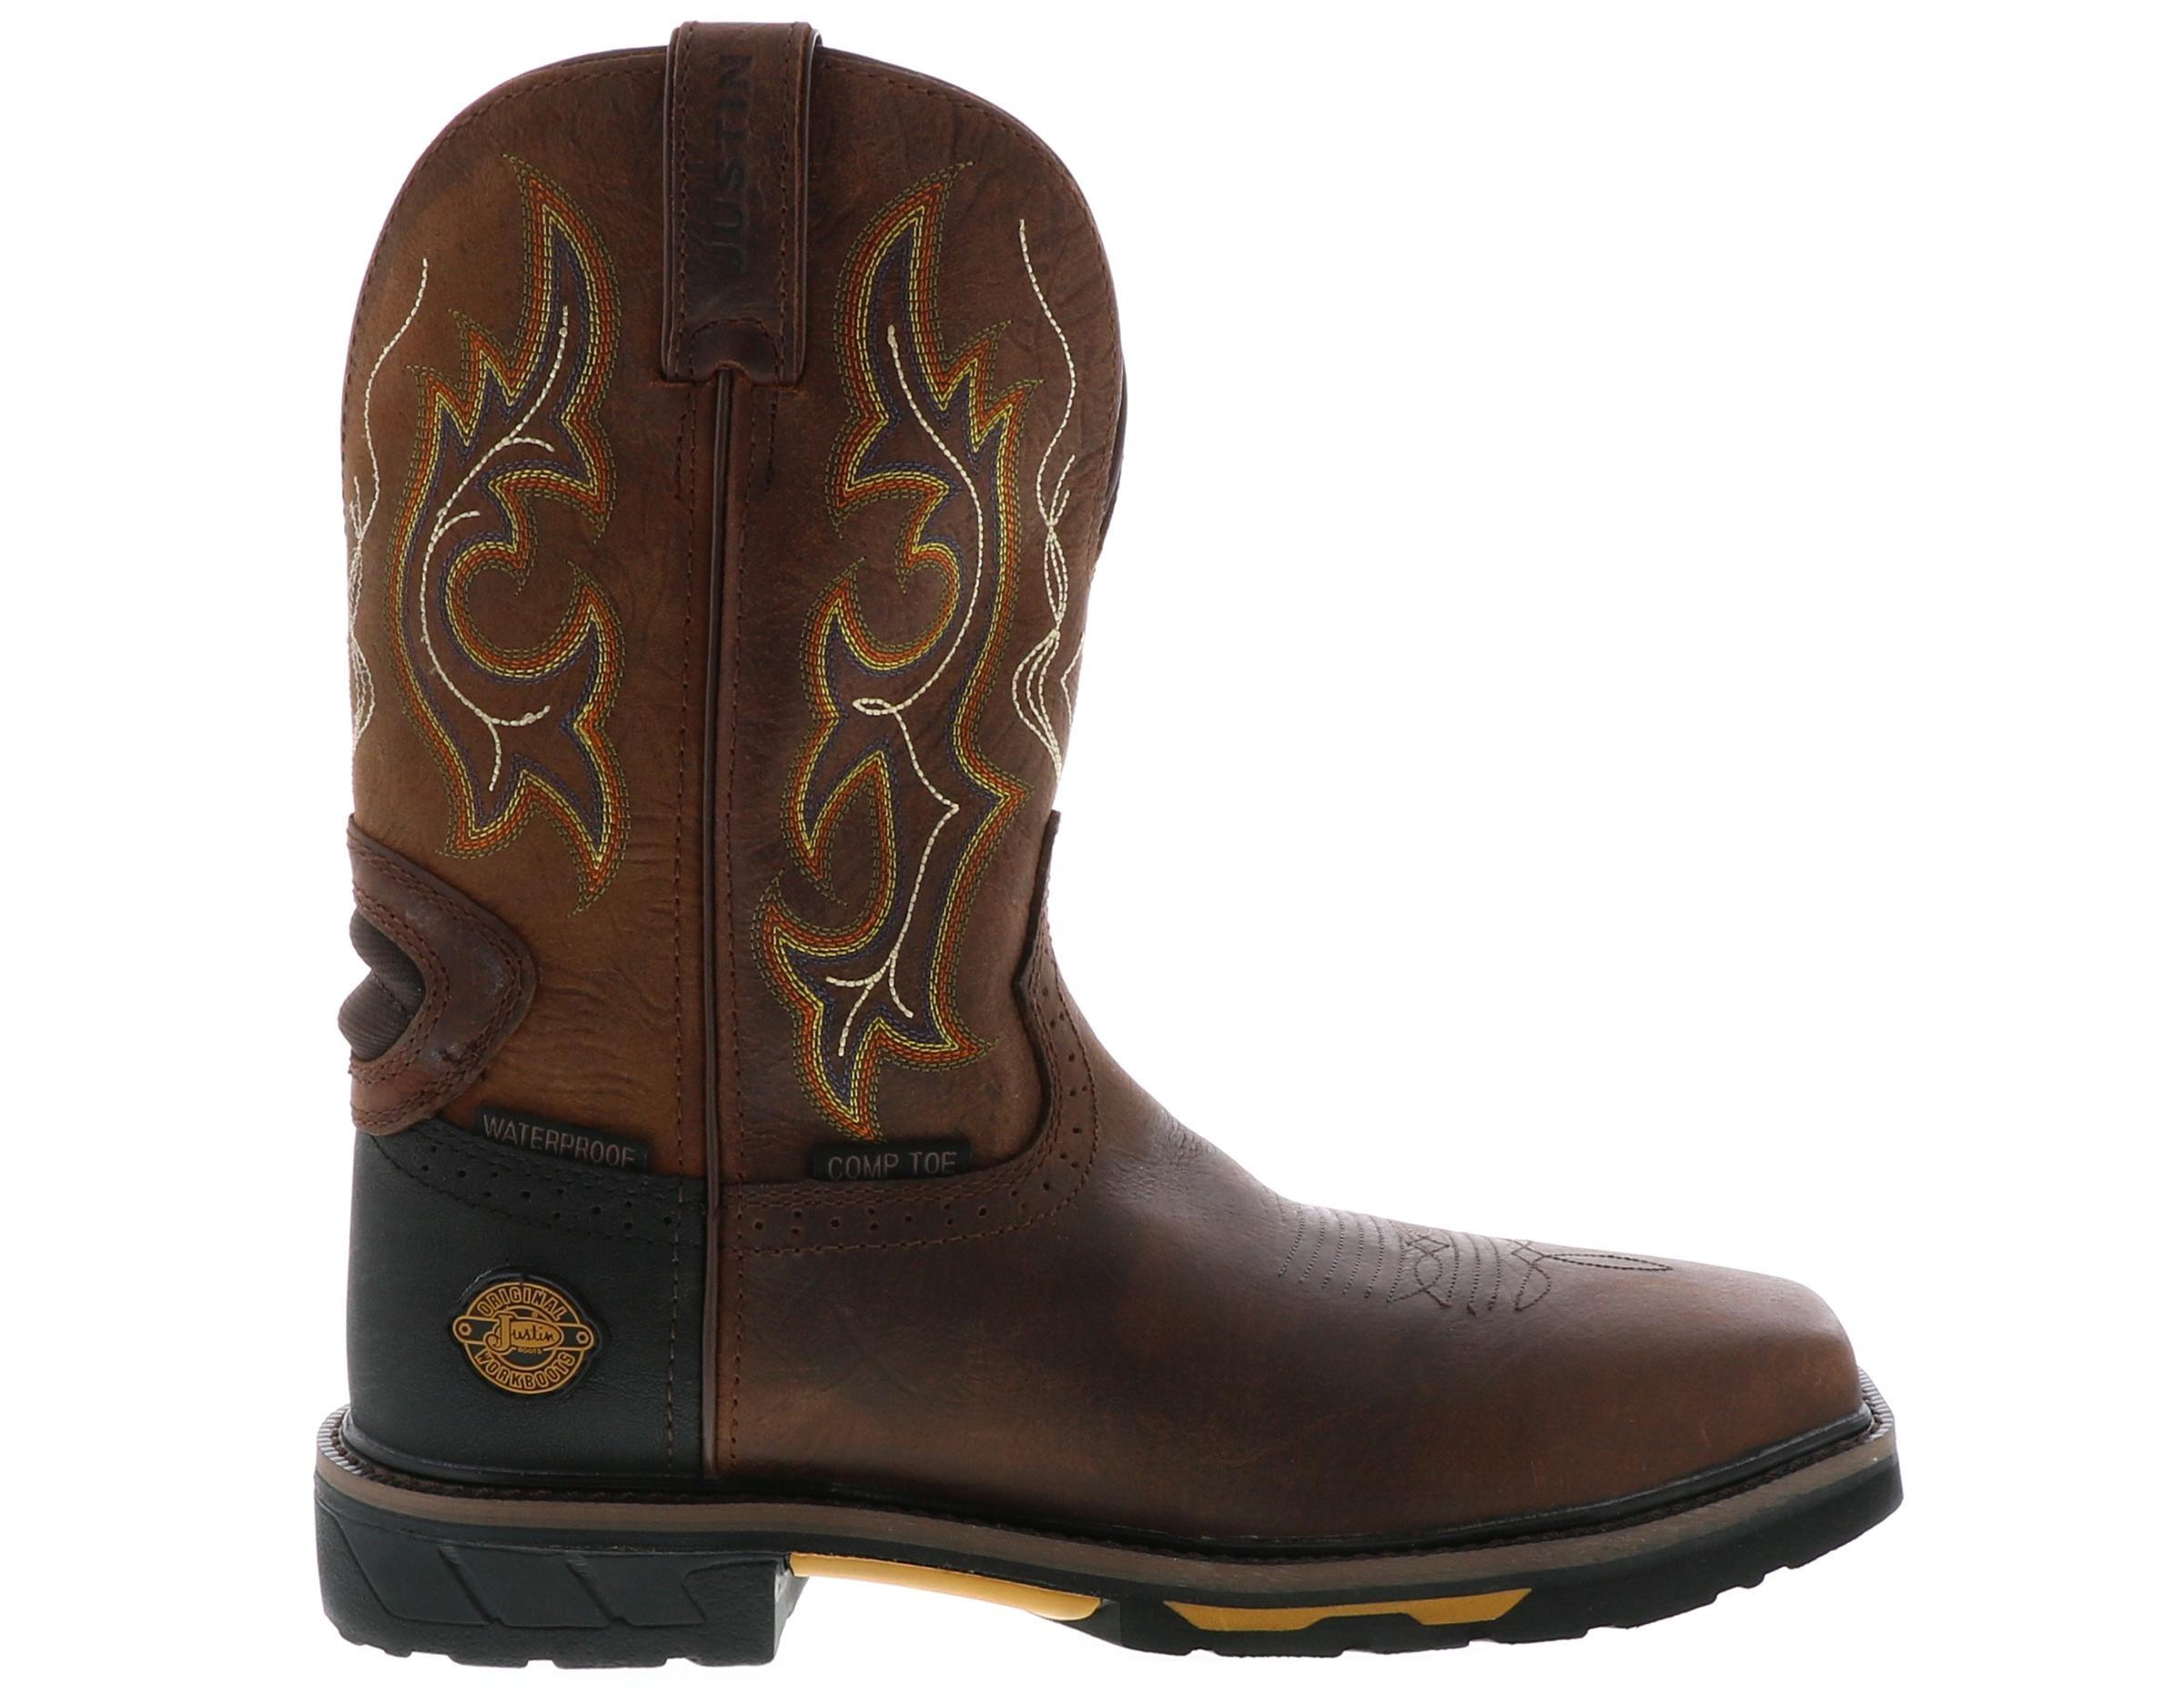 Men's Justin Boots Joist Comp Toe